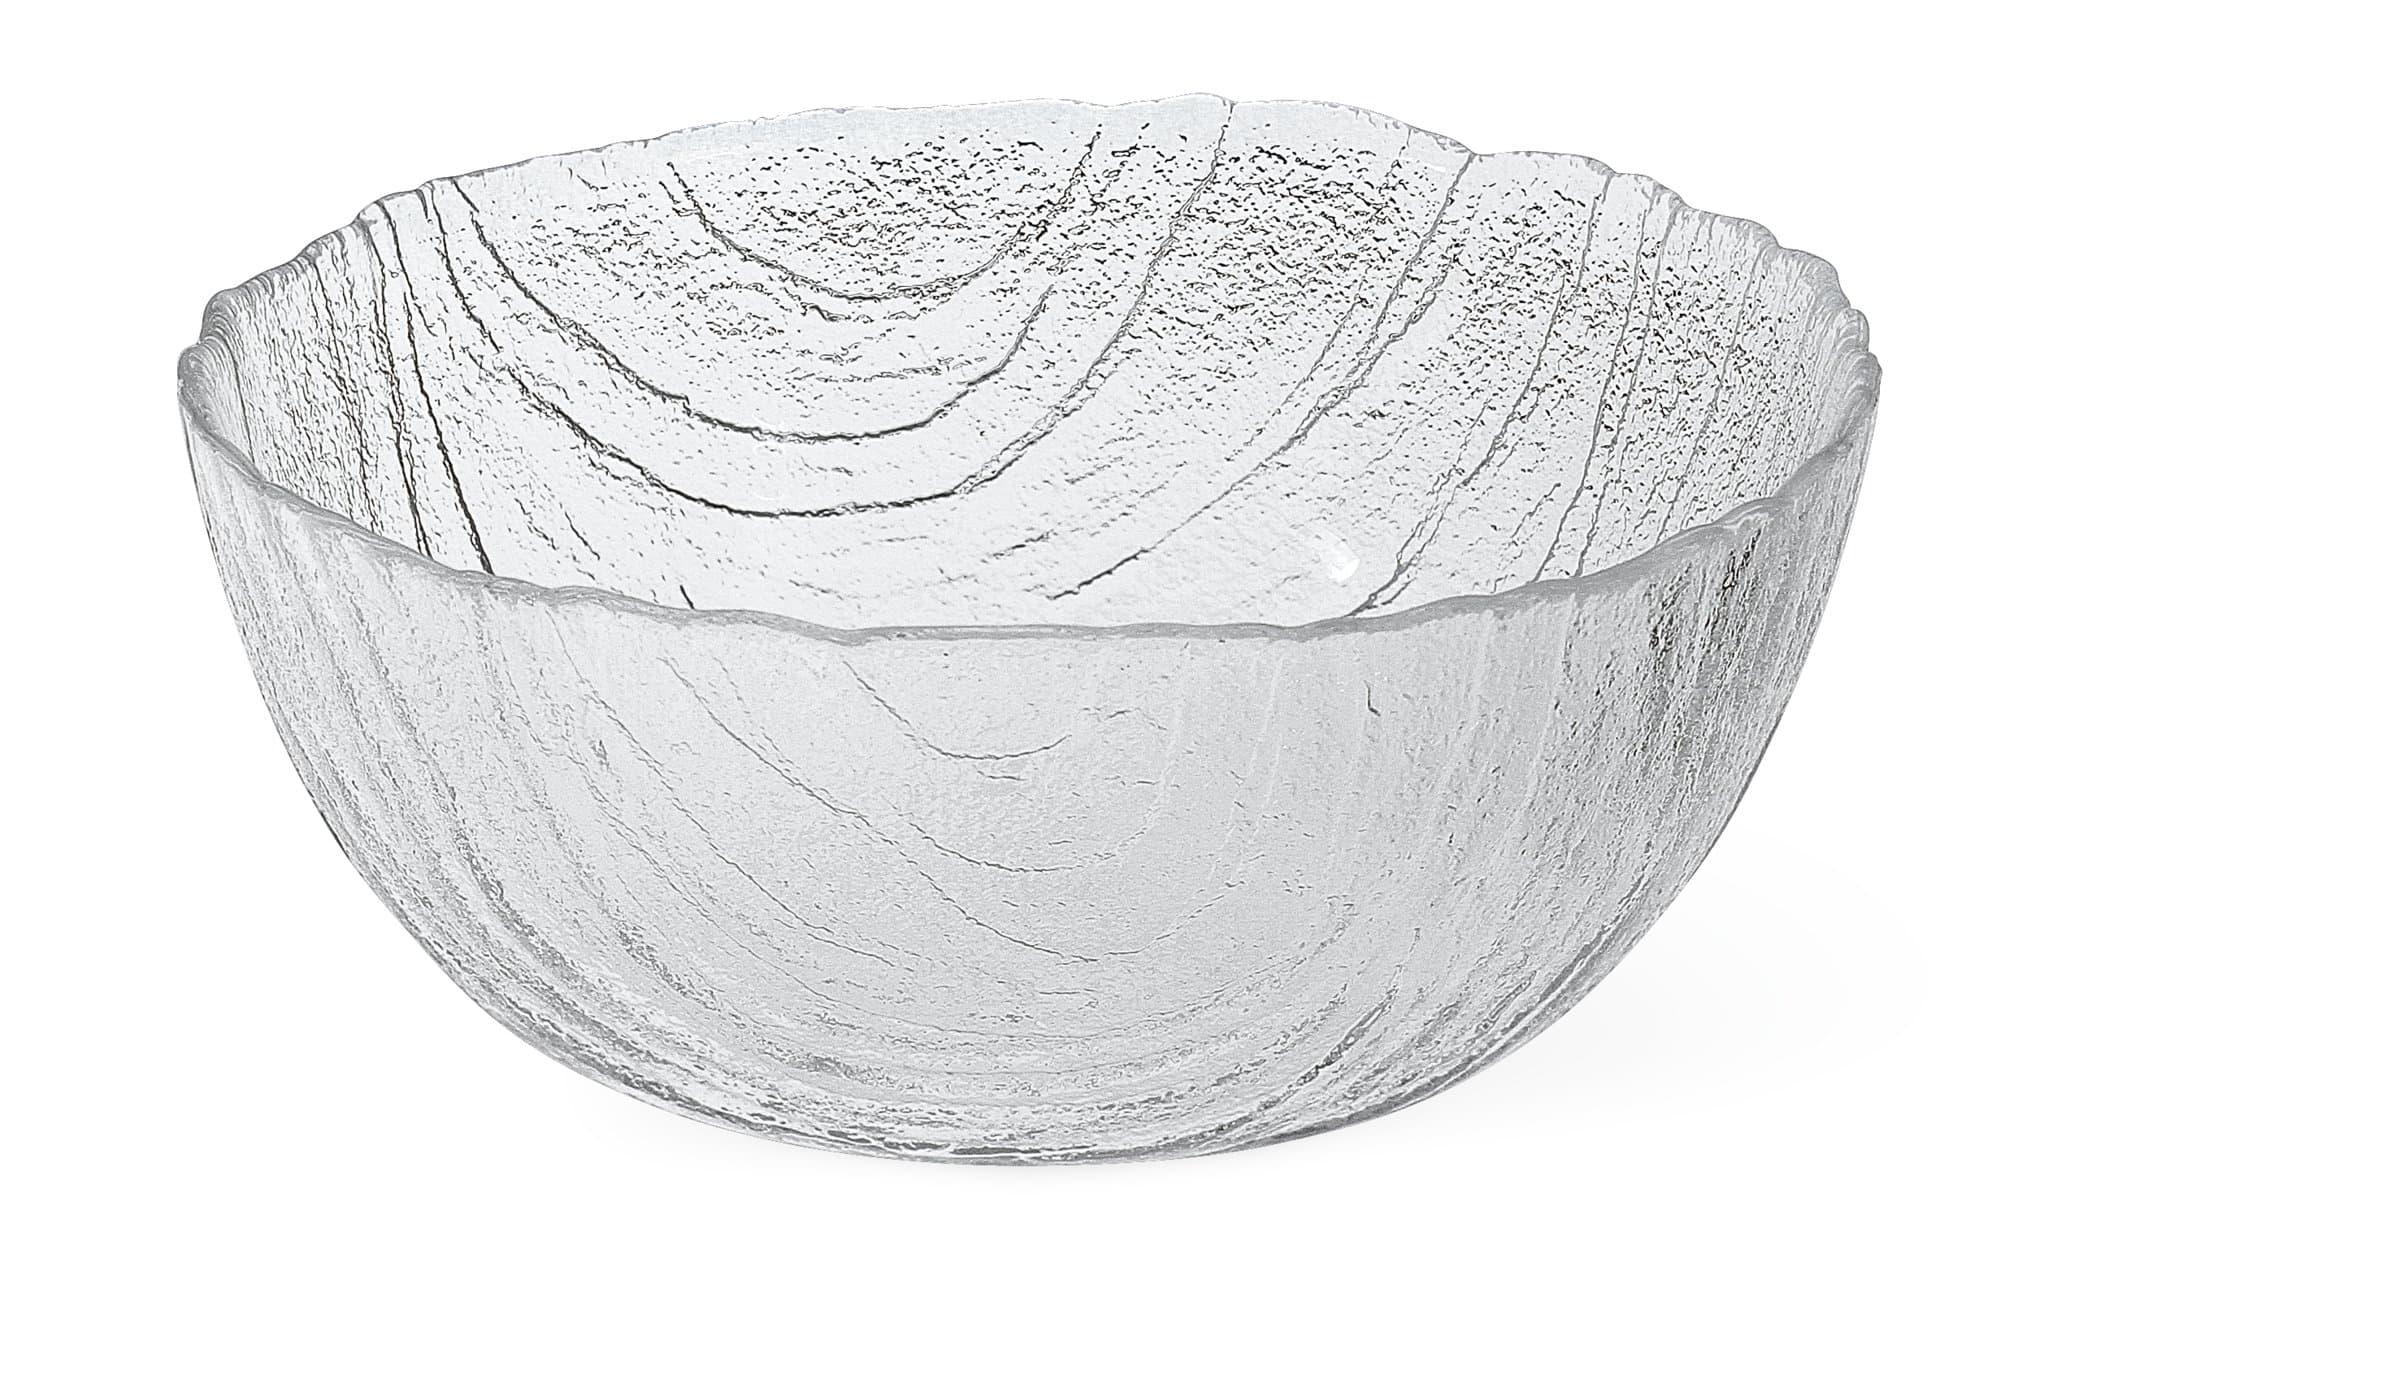 Cucina & Tavola VOLCANO Bowl